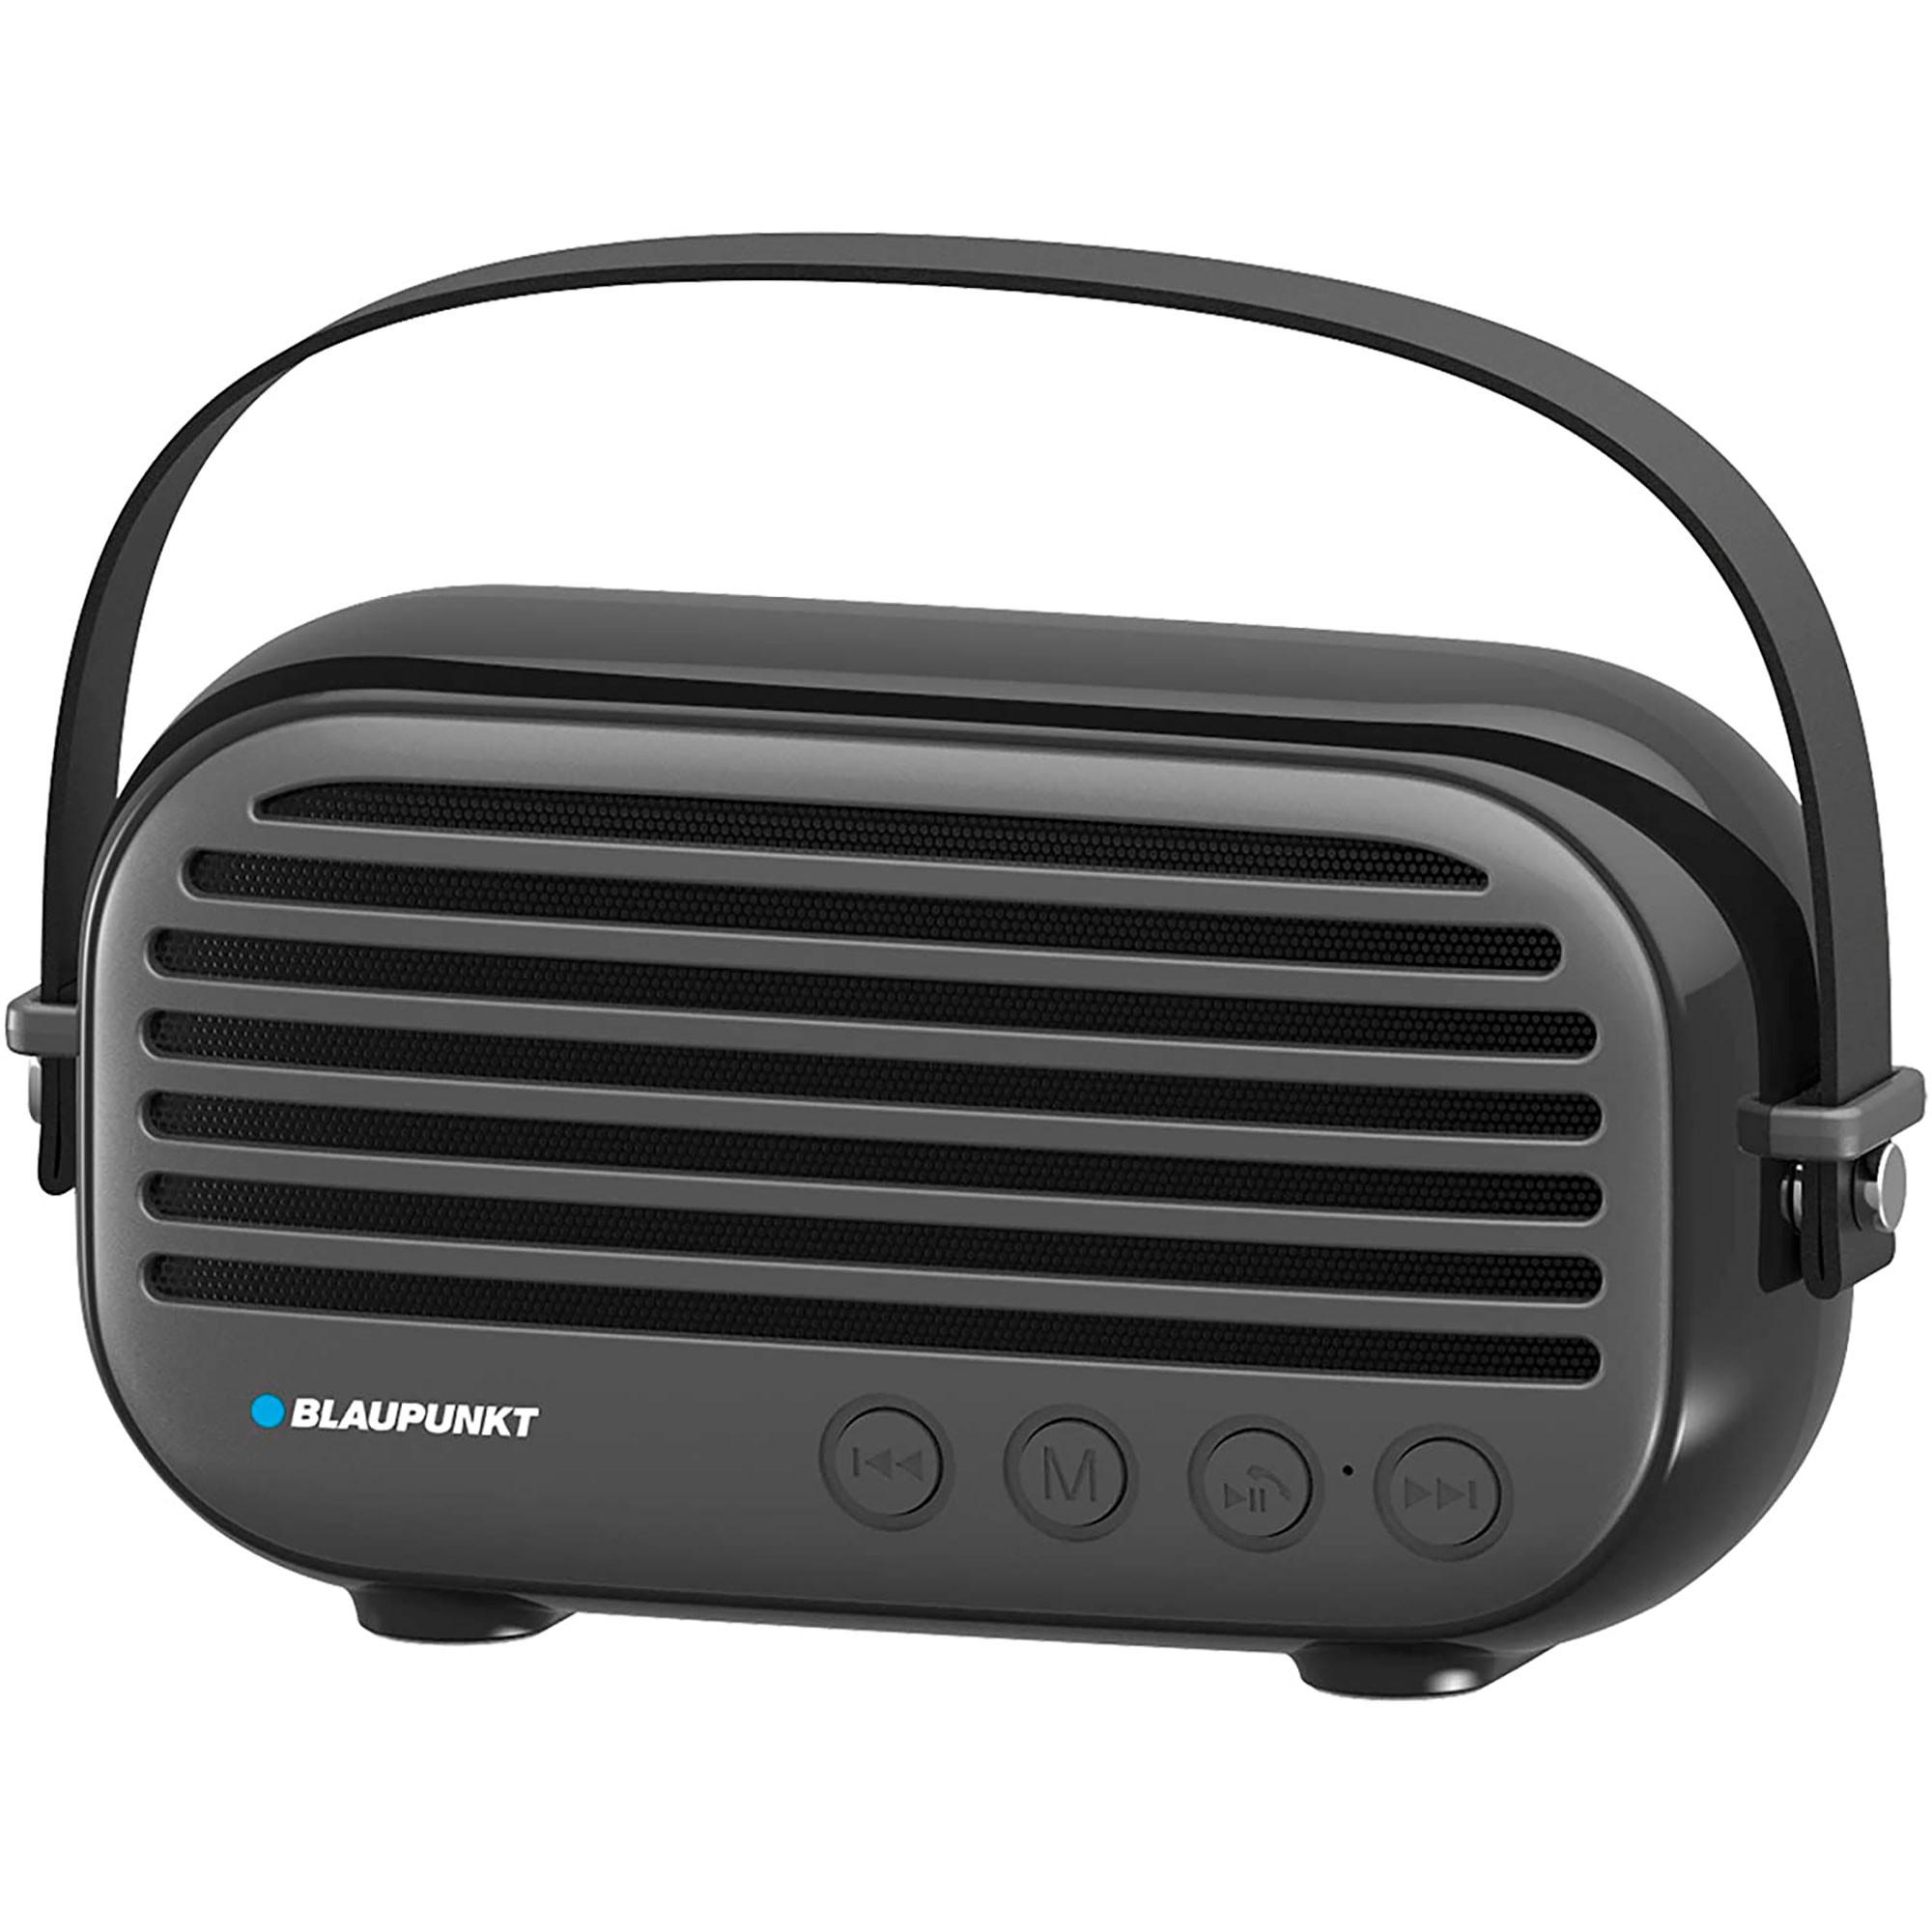 Blaupunkt BLP3350N Altavoz Bluetooth, Vintage, Radio Fm, USB, MICRO SD, AUX, Portátil, Potencia Sonido 10W, Inalámbrico, Manos Libres, Negro